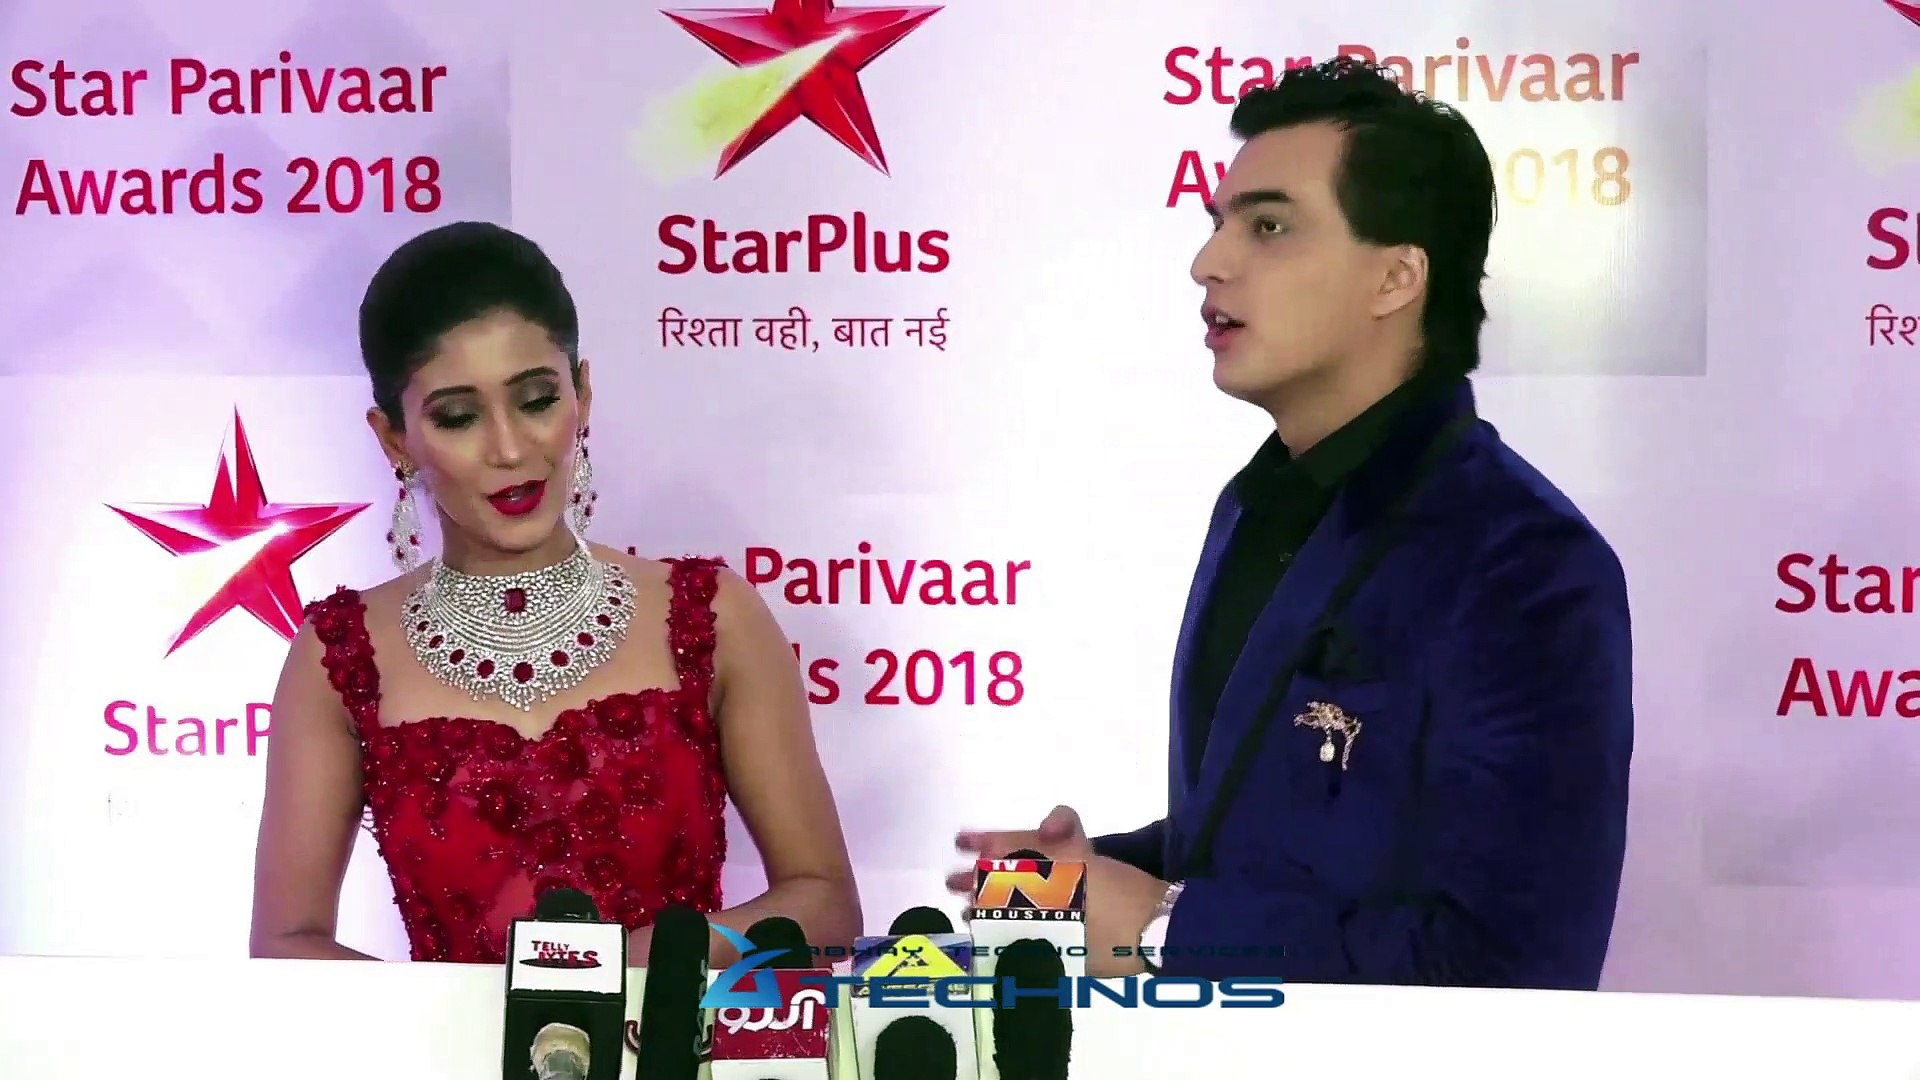 Star Parivaar Awards 2018 Red Carpet | Shivangi Joshi, Mohsin Khan